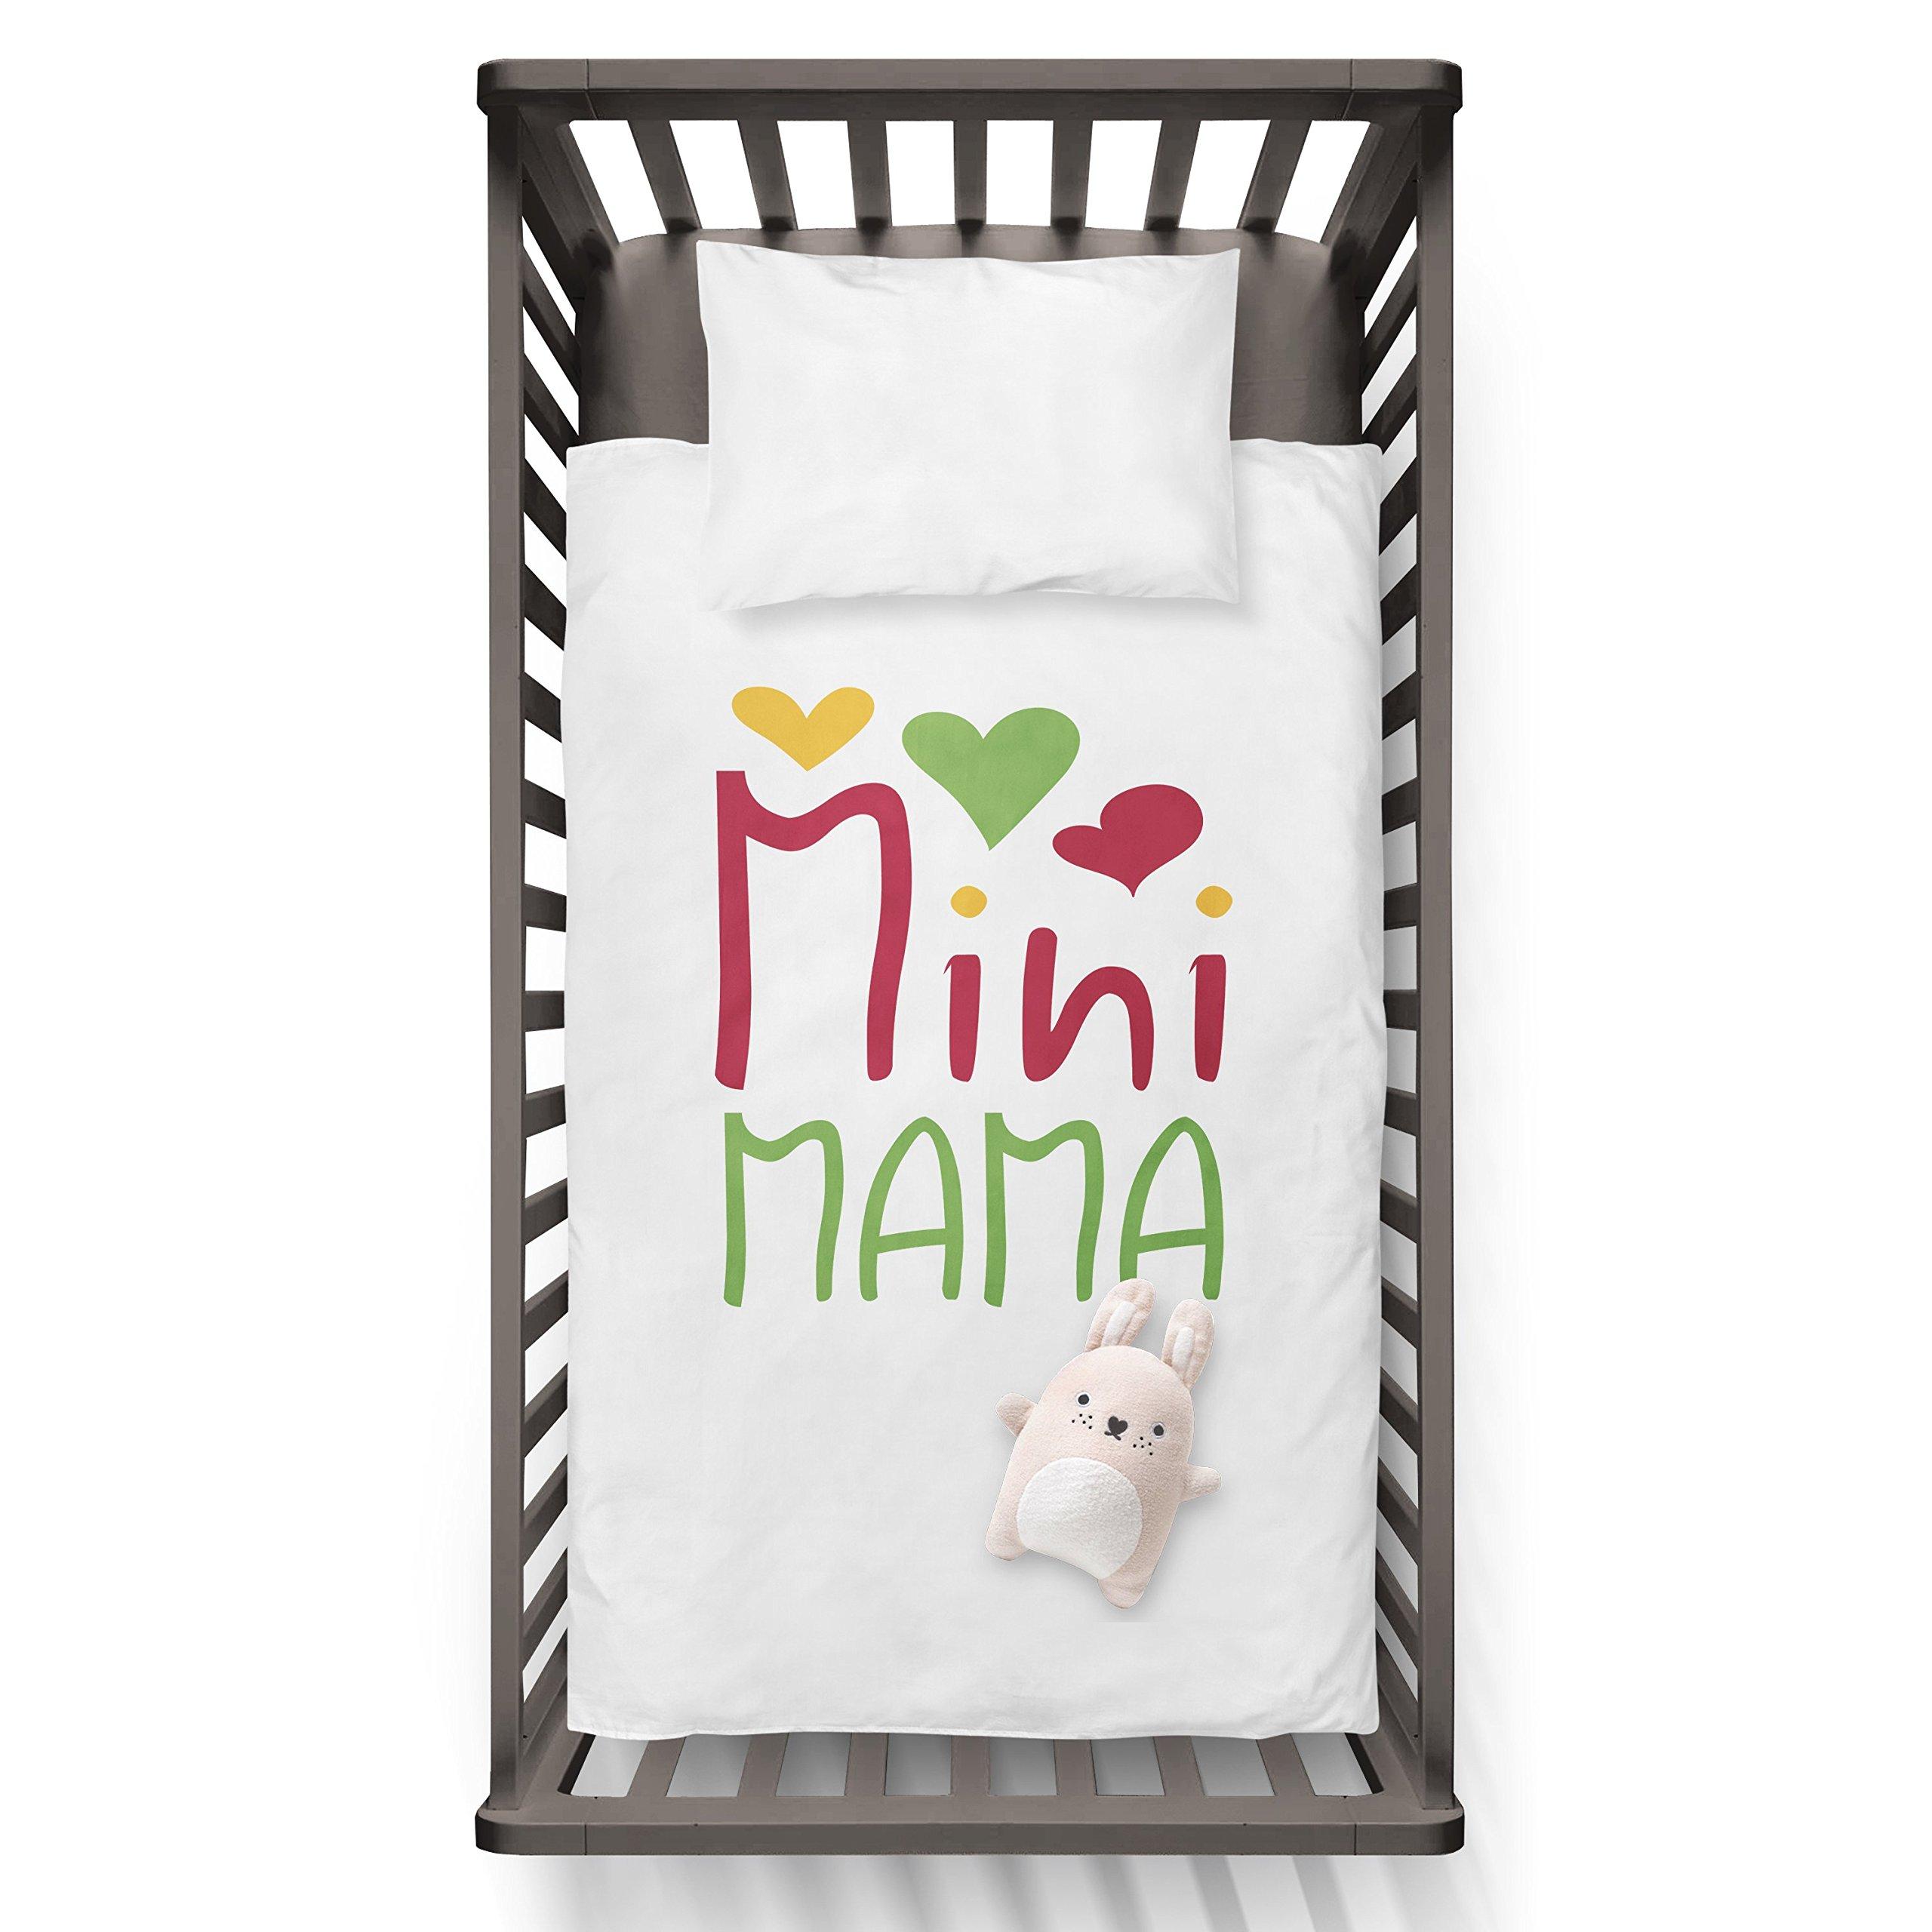 Mini MAMA Funny Humor Hip Baby Duvet /Pillow set,Toddler Duvet,Oeko-Tex,Personalized duvet and pillow,Oraganic,gift